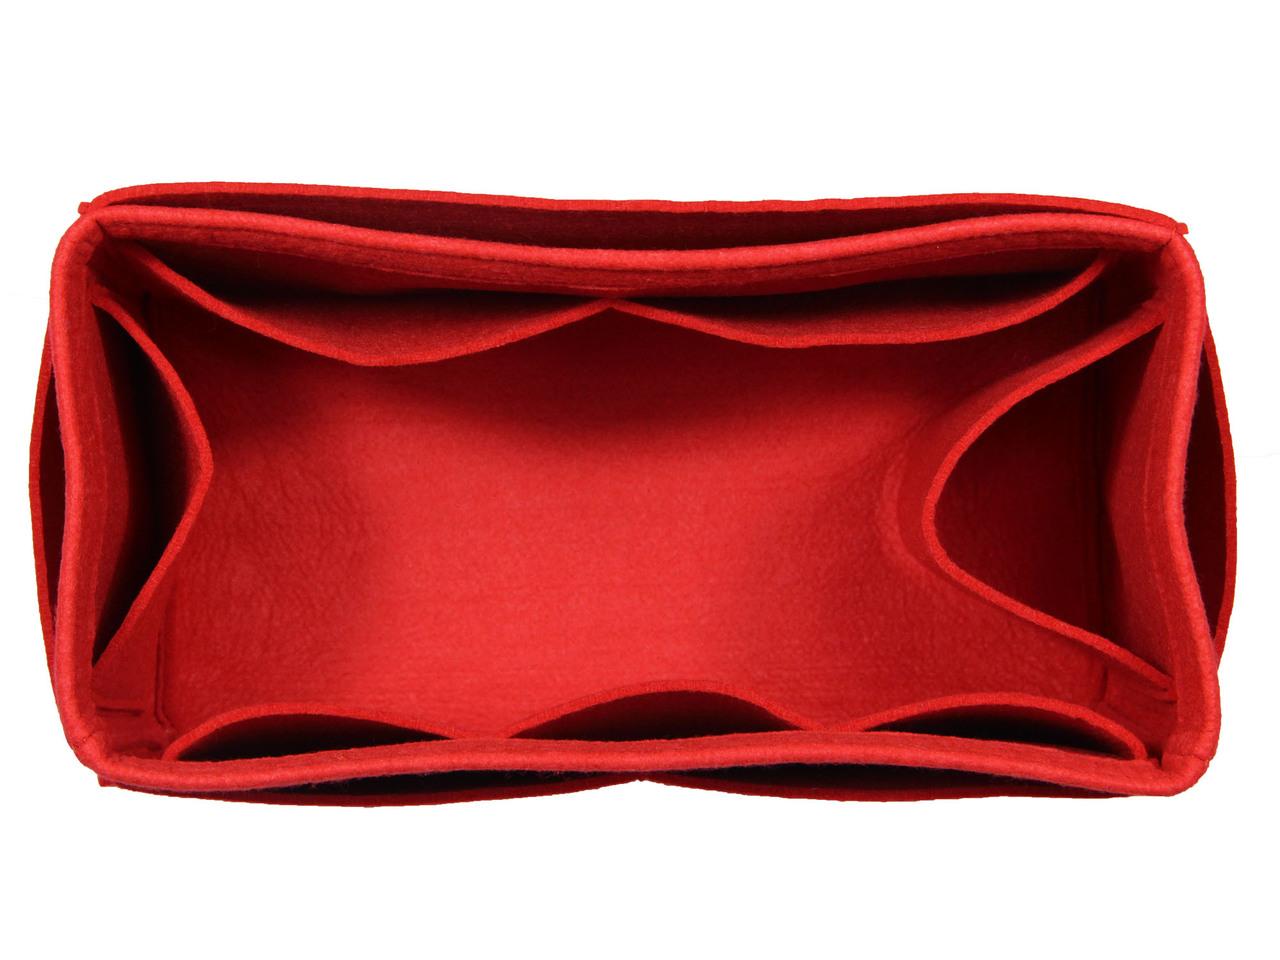 d9395d0b694a Customizable Felt Tote Bag Organizer